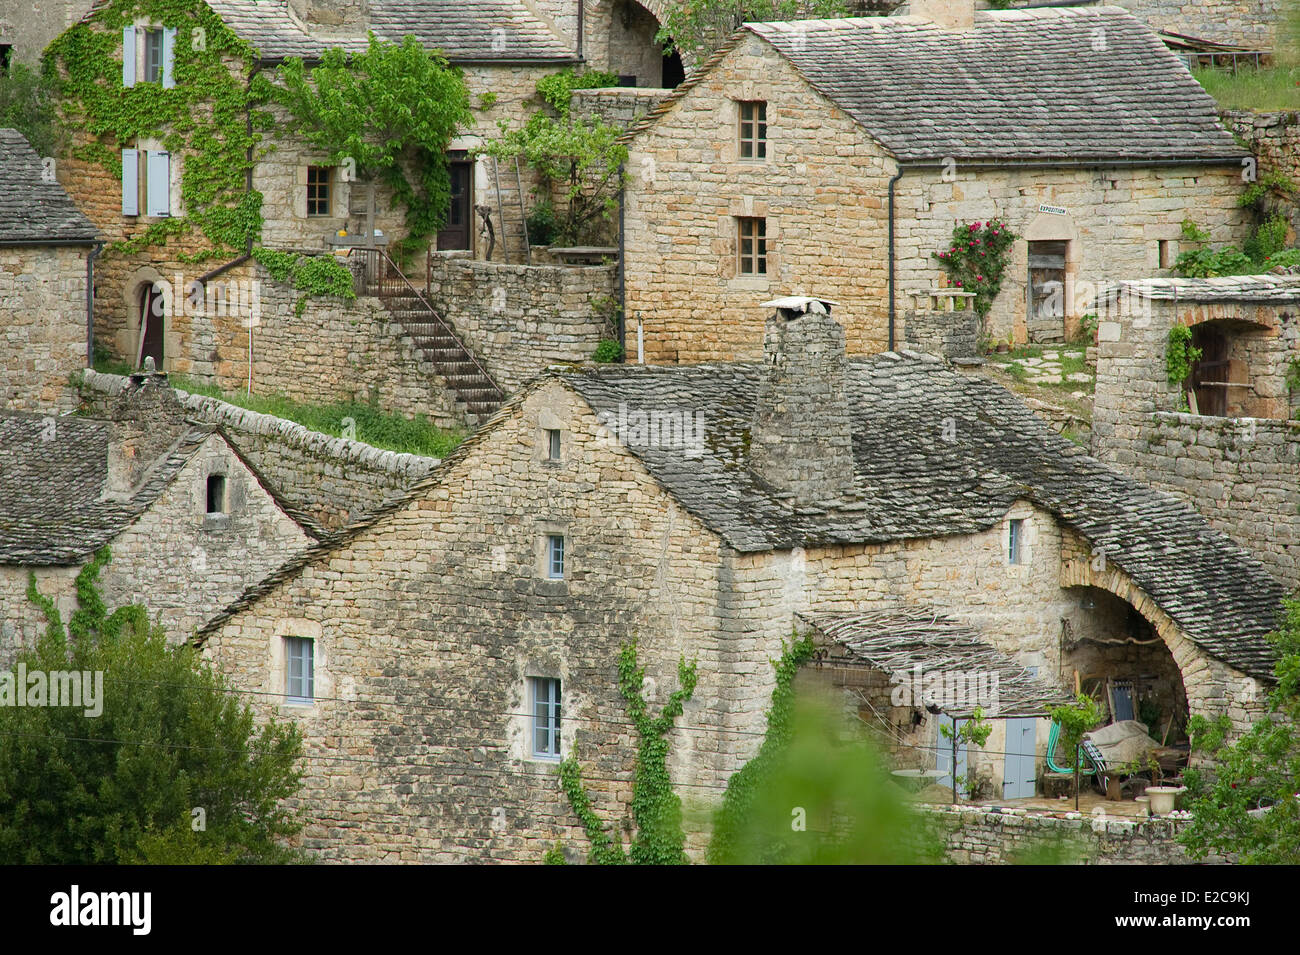 France, Lozere, Sainte Enimie hamlet Hauterives, Gorges du Tarn - Stock Image